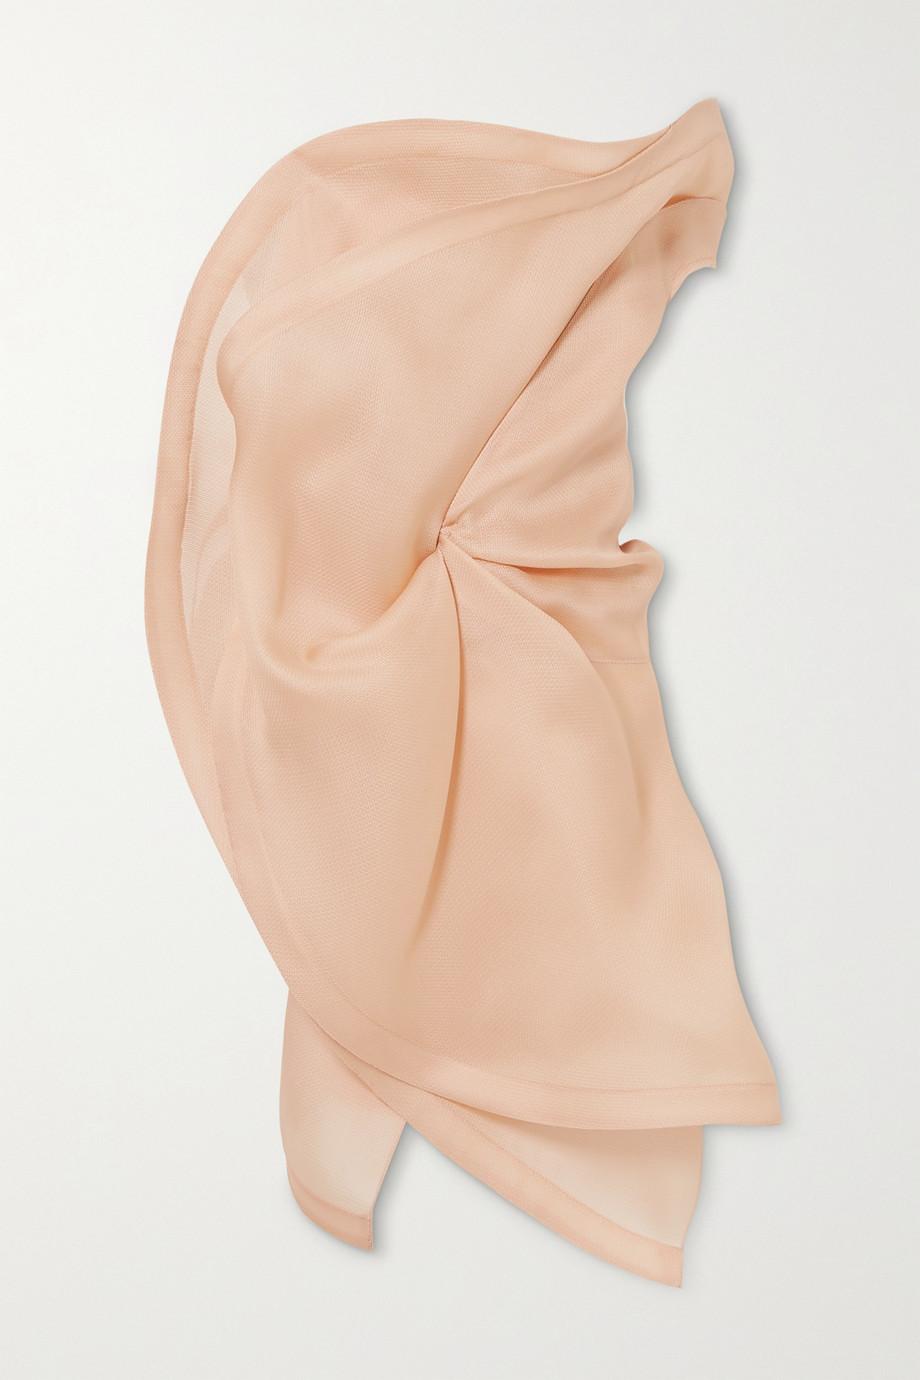 Nina Ricci Asymmetric strapless ruffled silk-gazar top